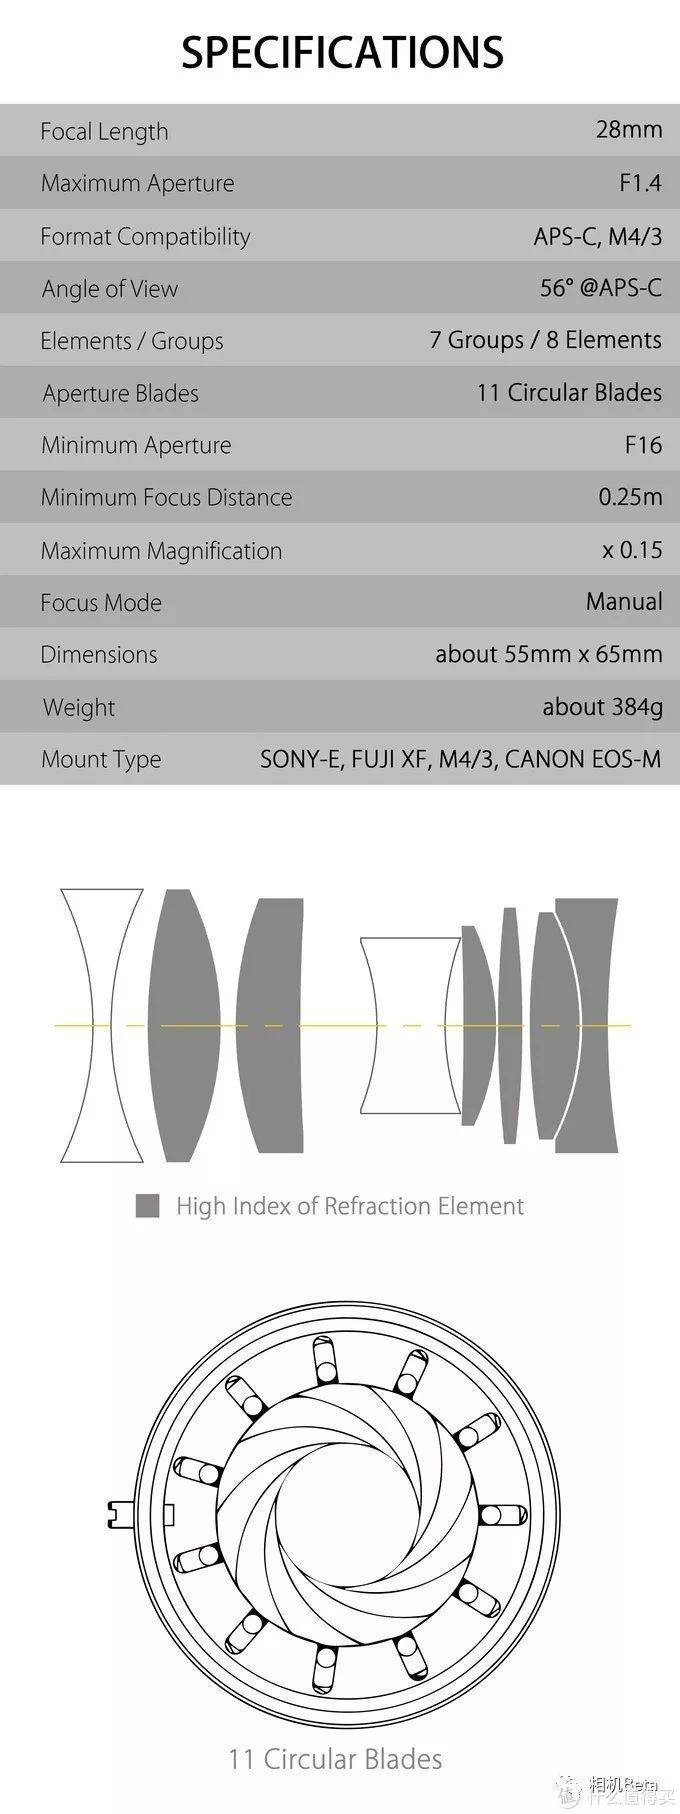 Kamlan 28mm f1.4微单镜头